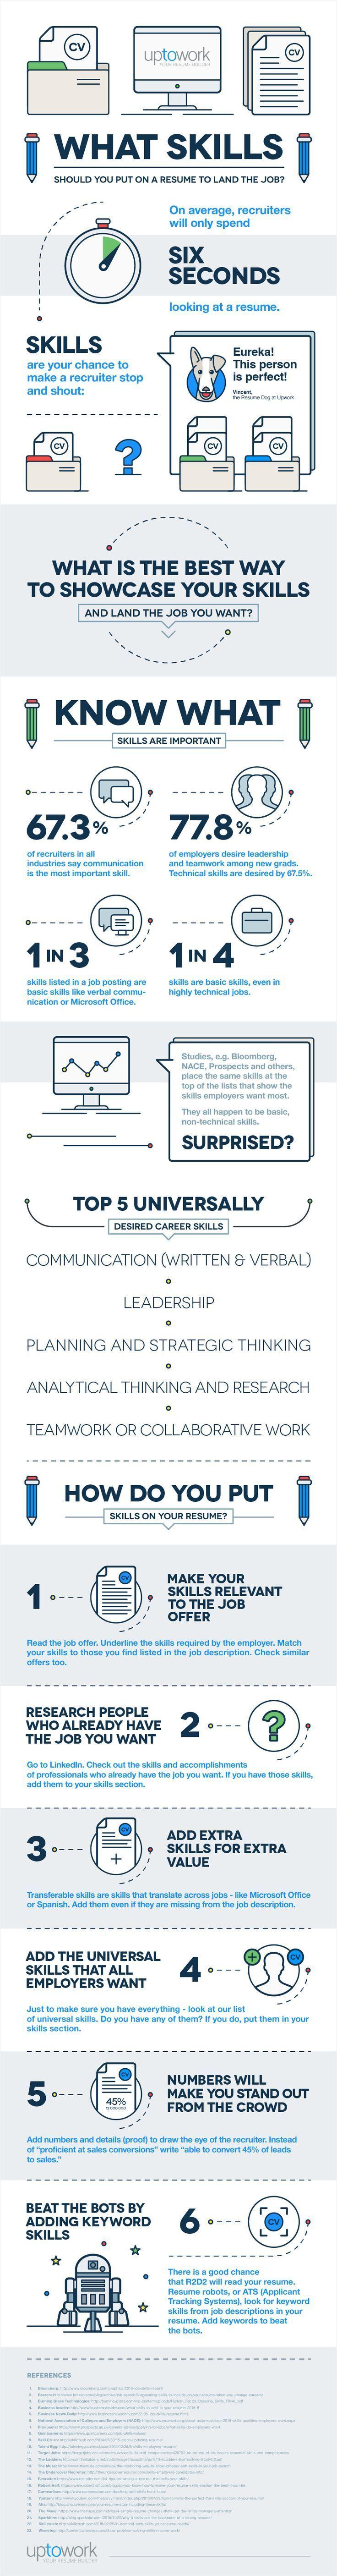 What Skills to Put on a Resume? #Infographic #Career #Resume #PuttingTipsDude